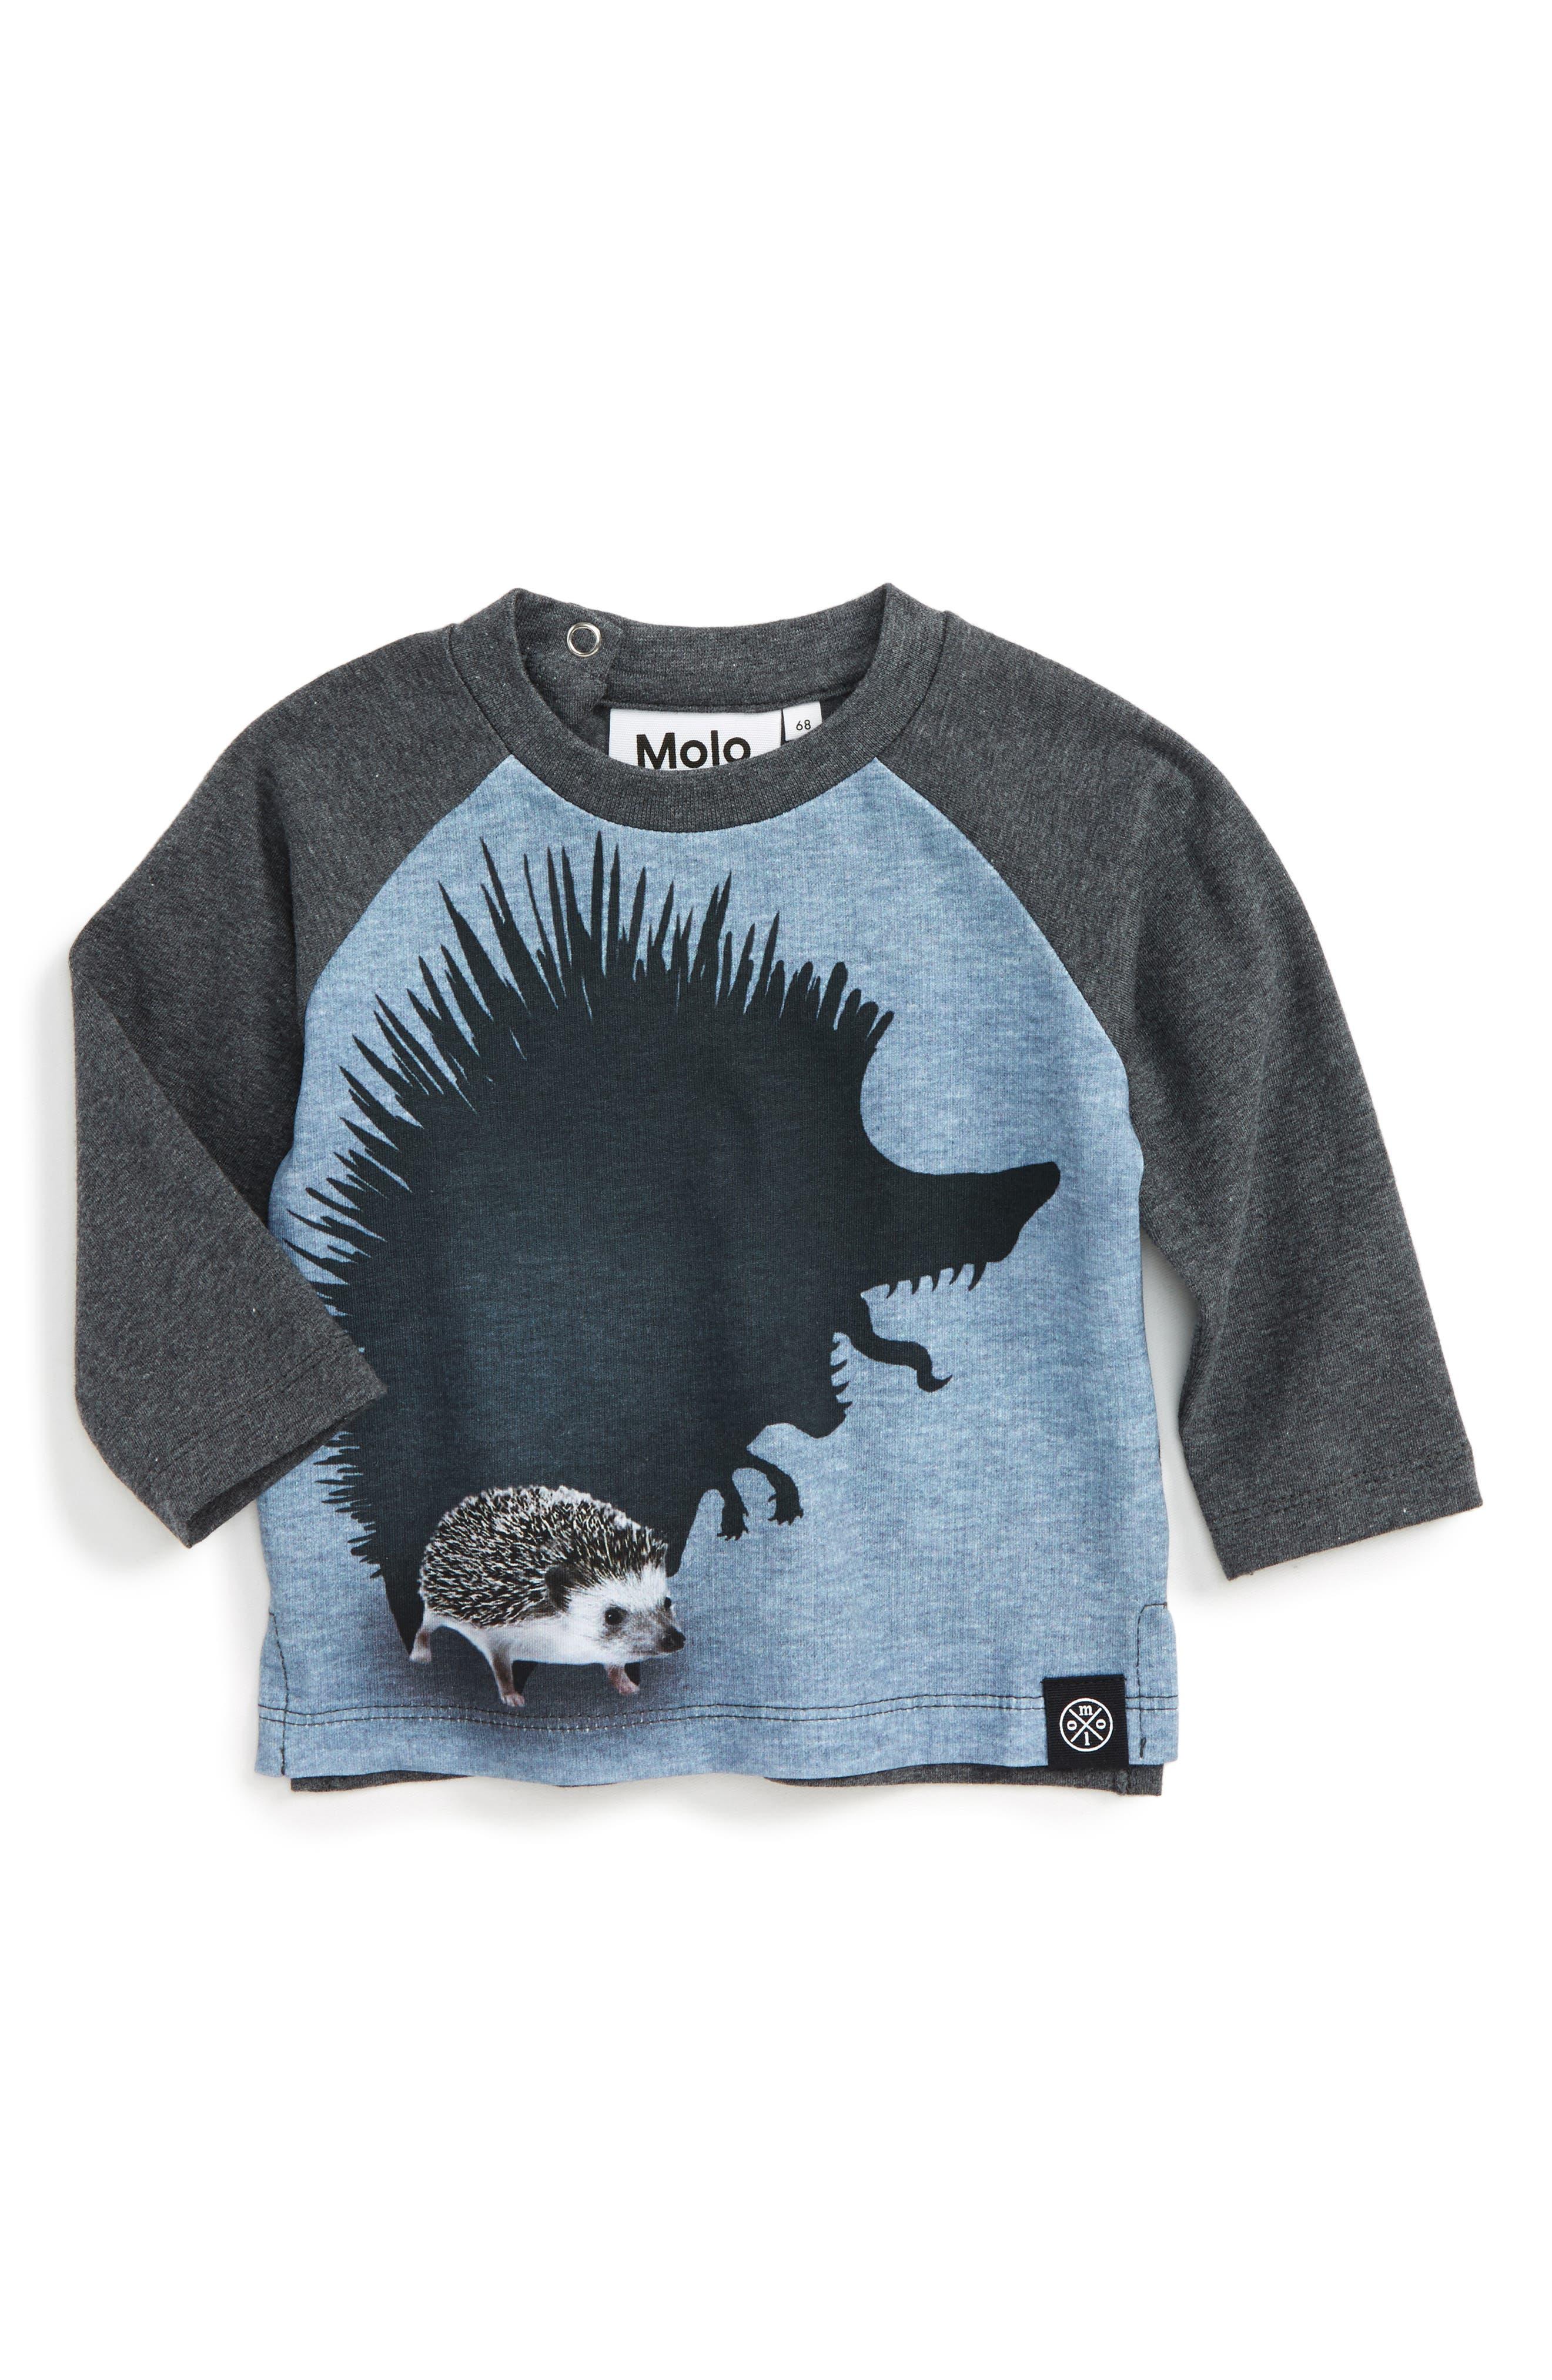 MOLO Evan Graphic T-Shirt